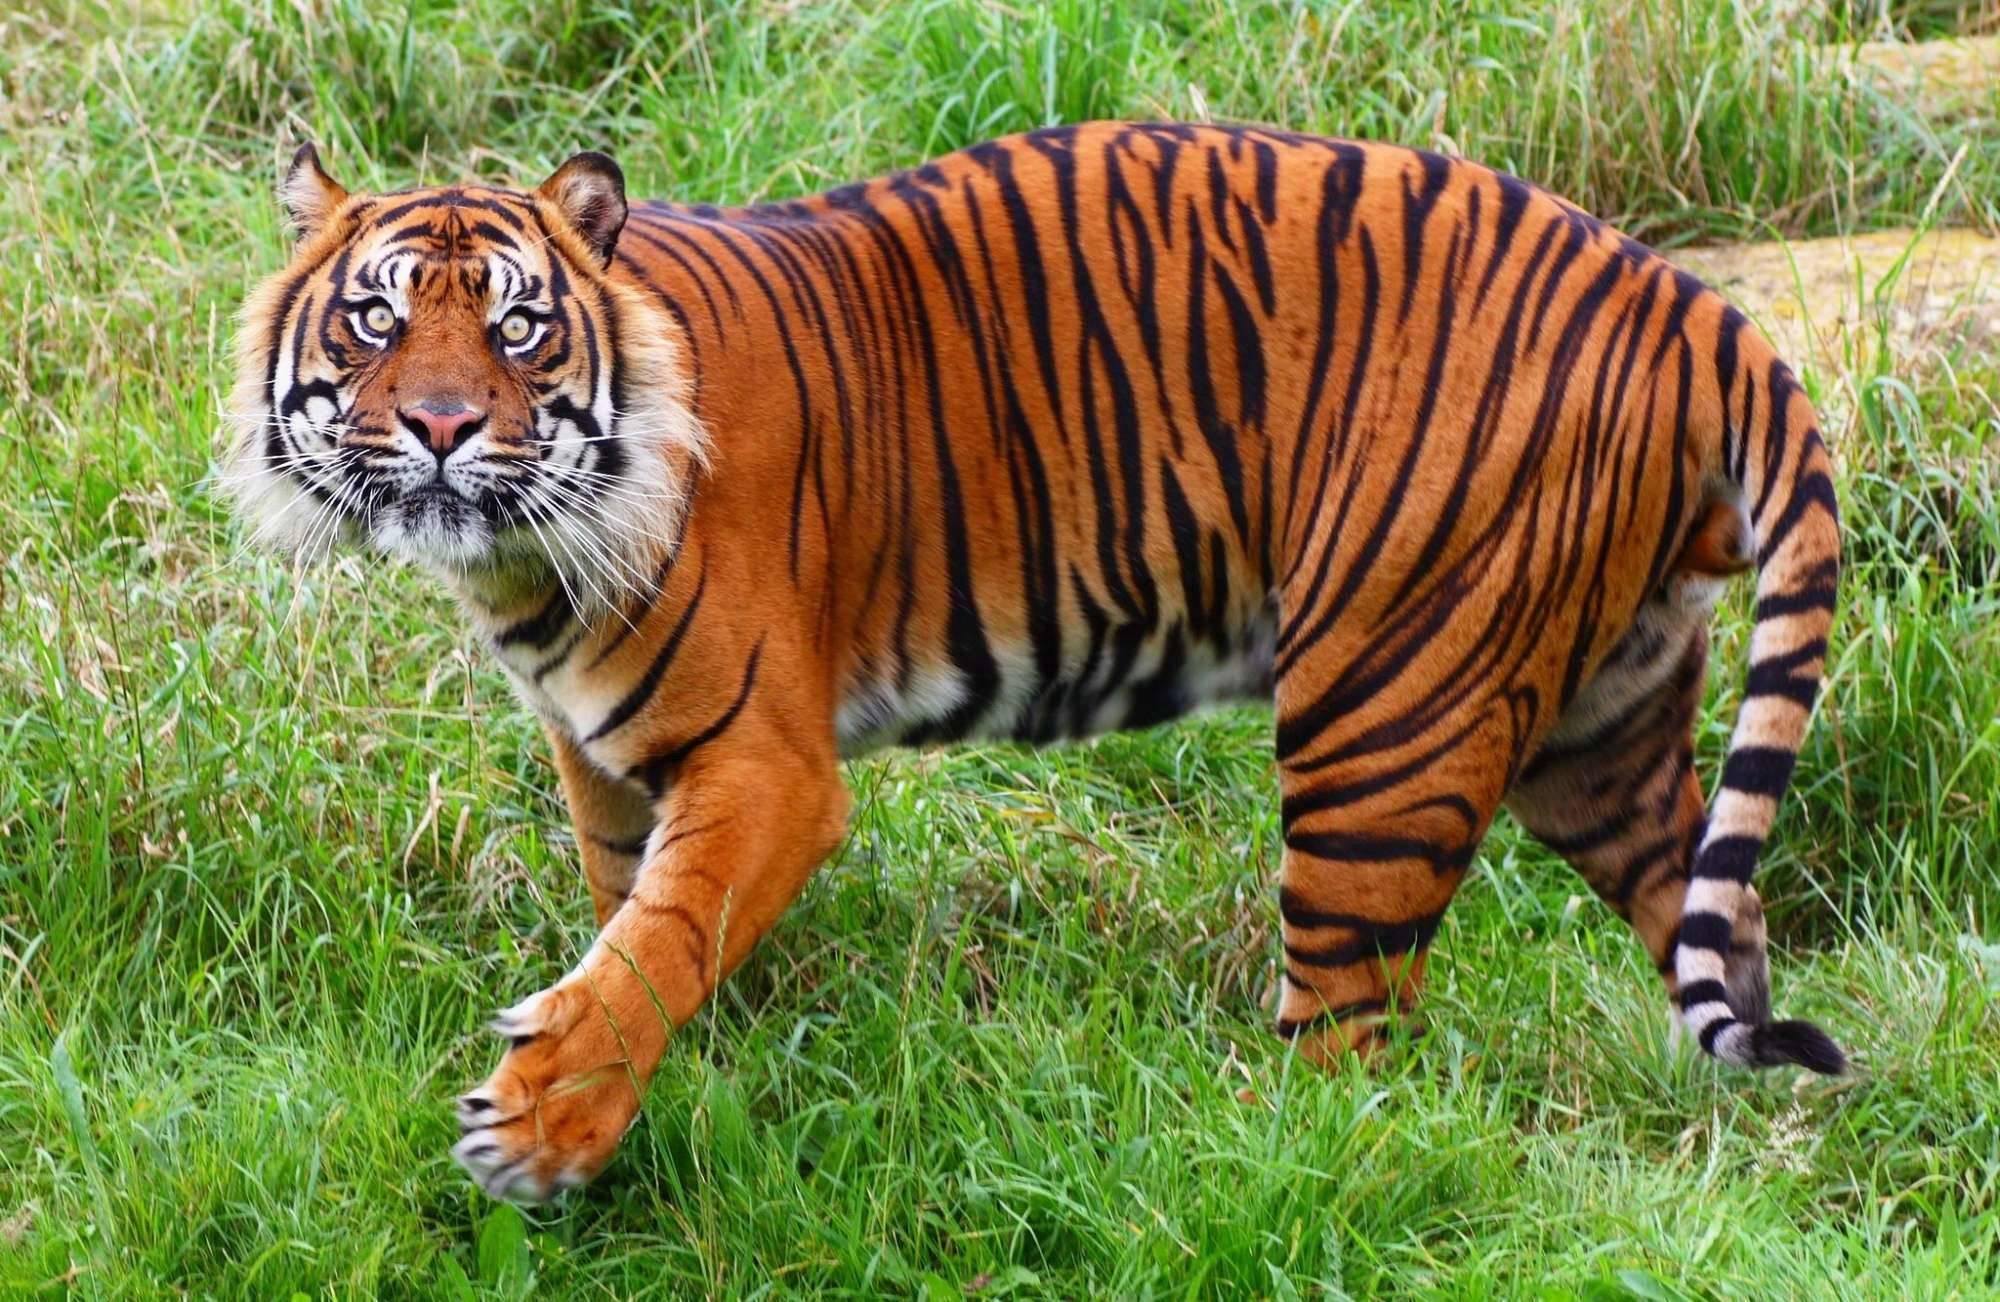 картинка где тигр девушка может